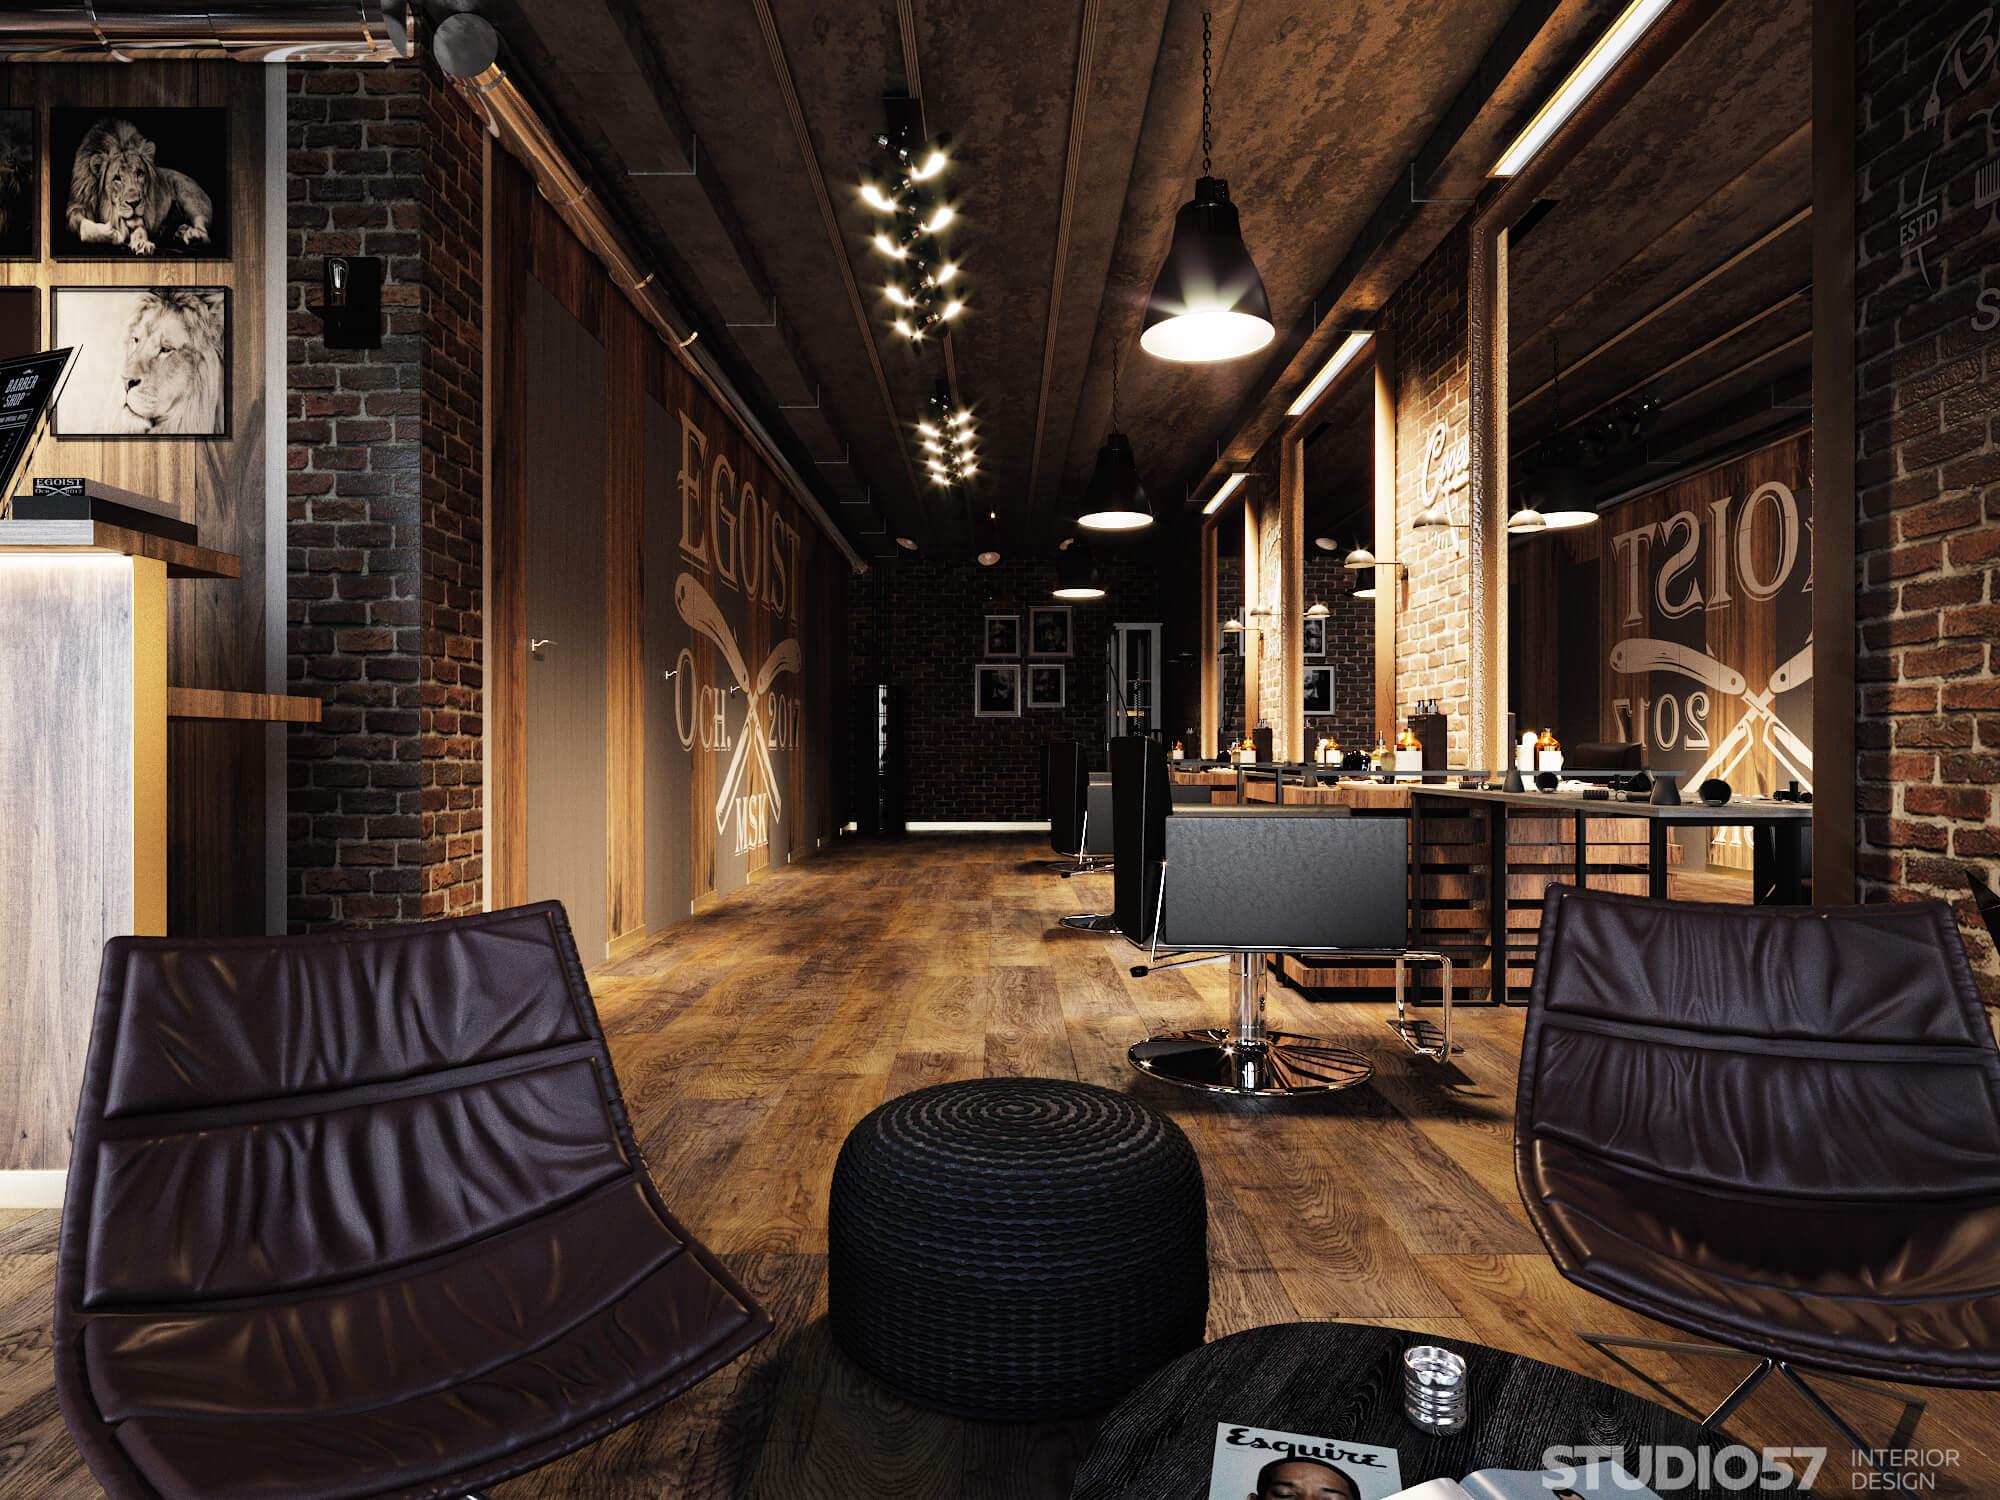 Beautiful interior of the barbershop